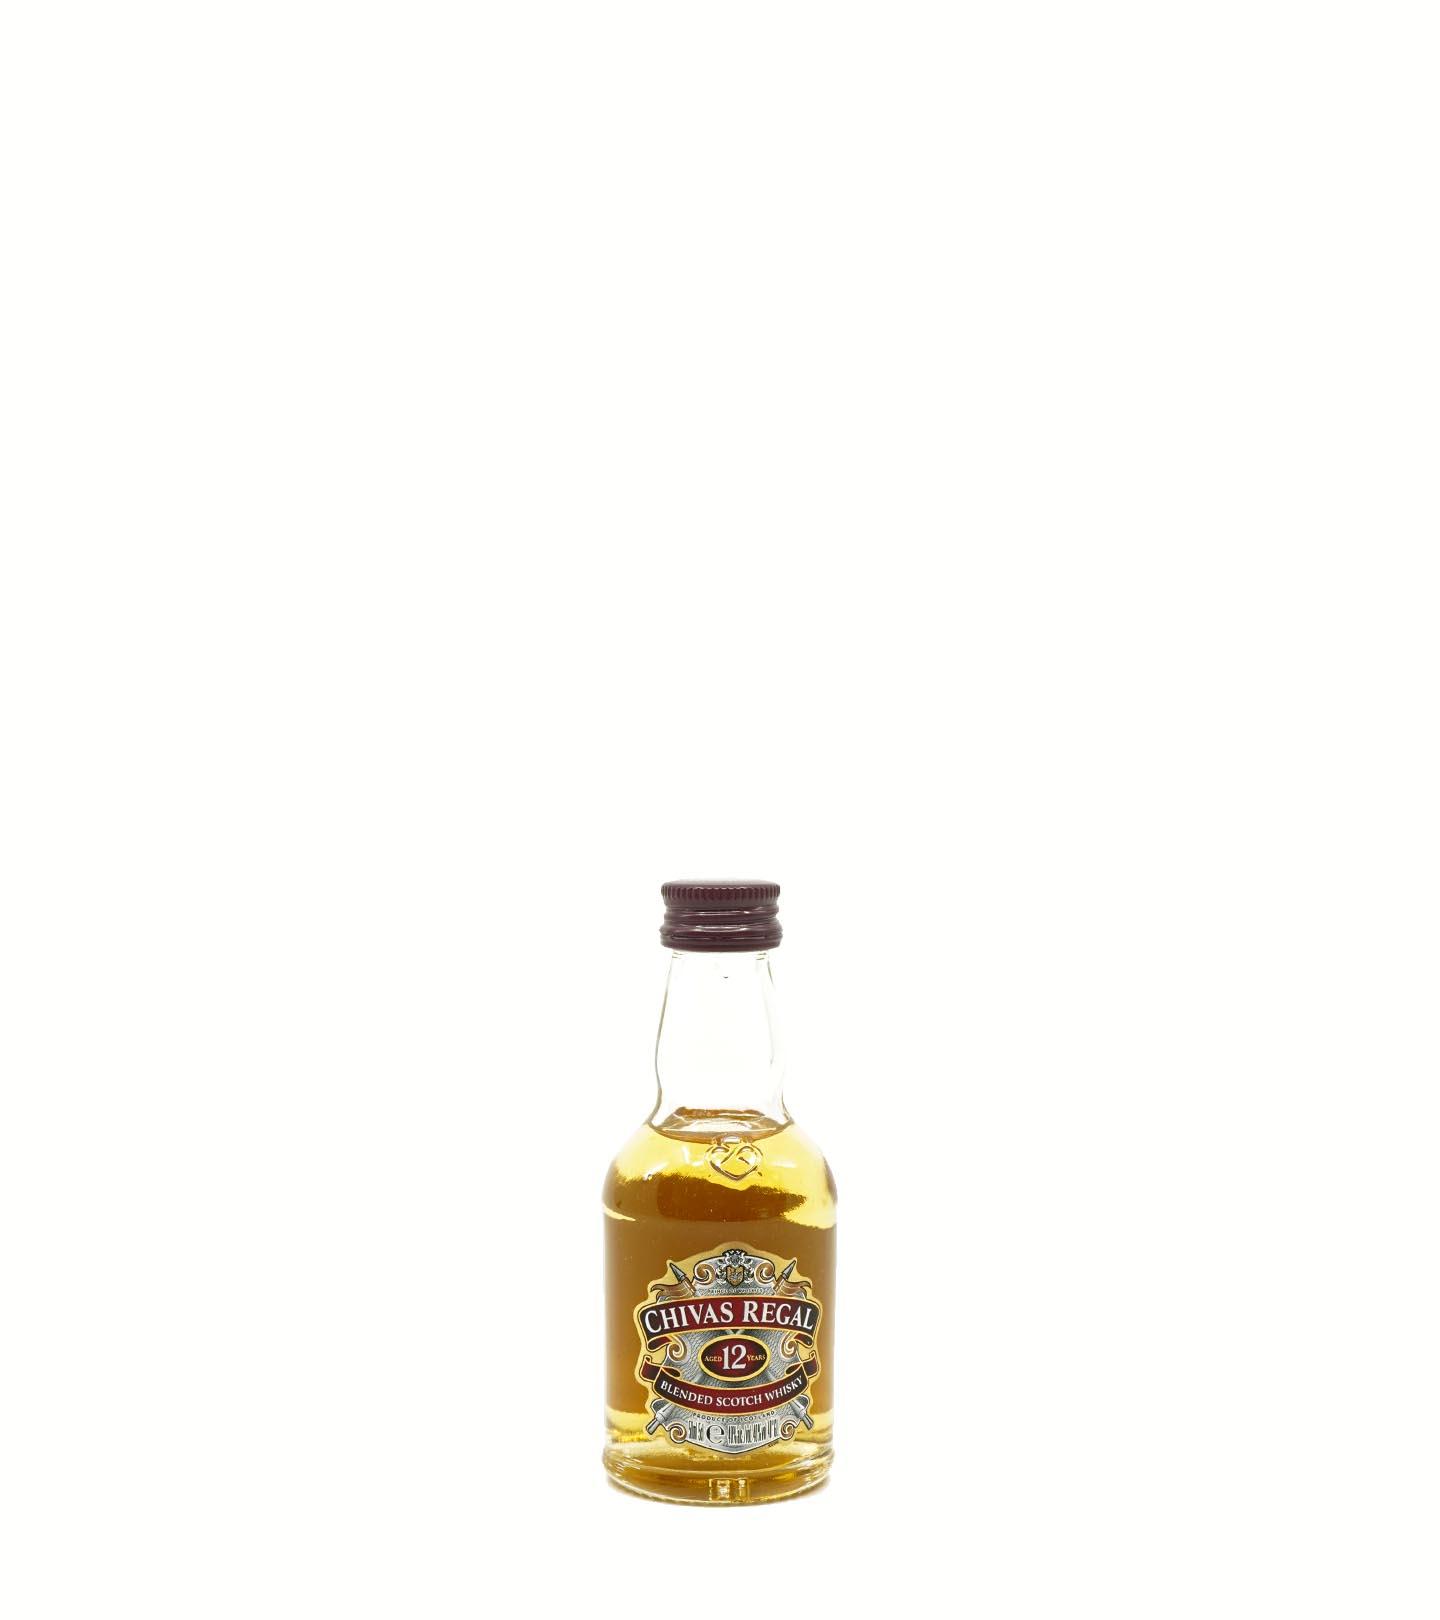 Whisky Chivas Regal 12 Anos 5cl